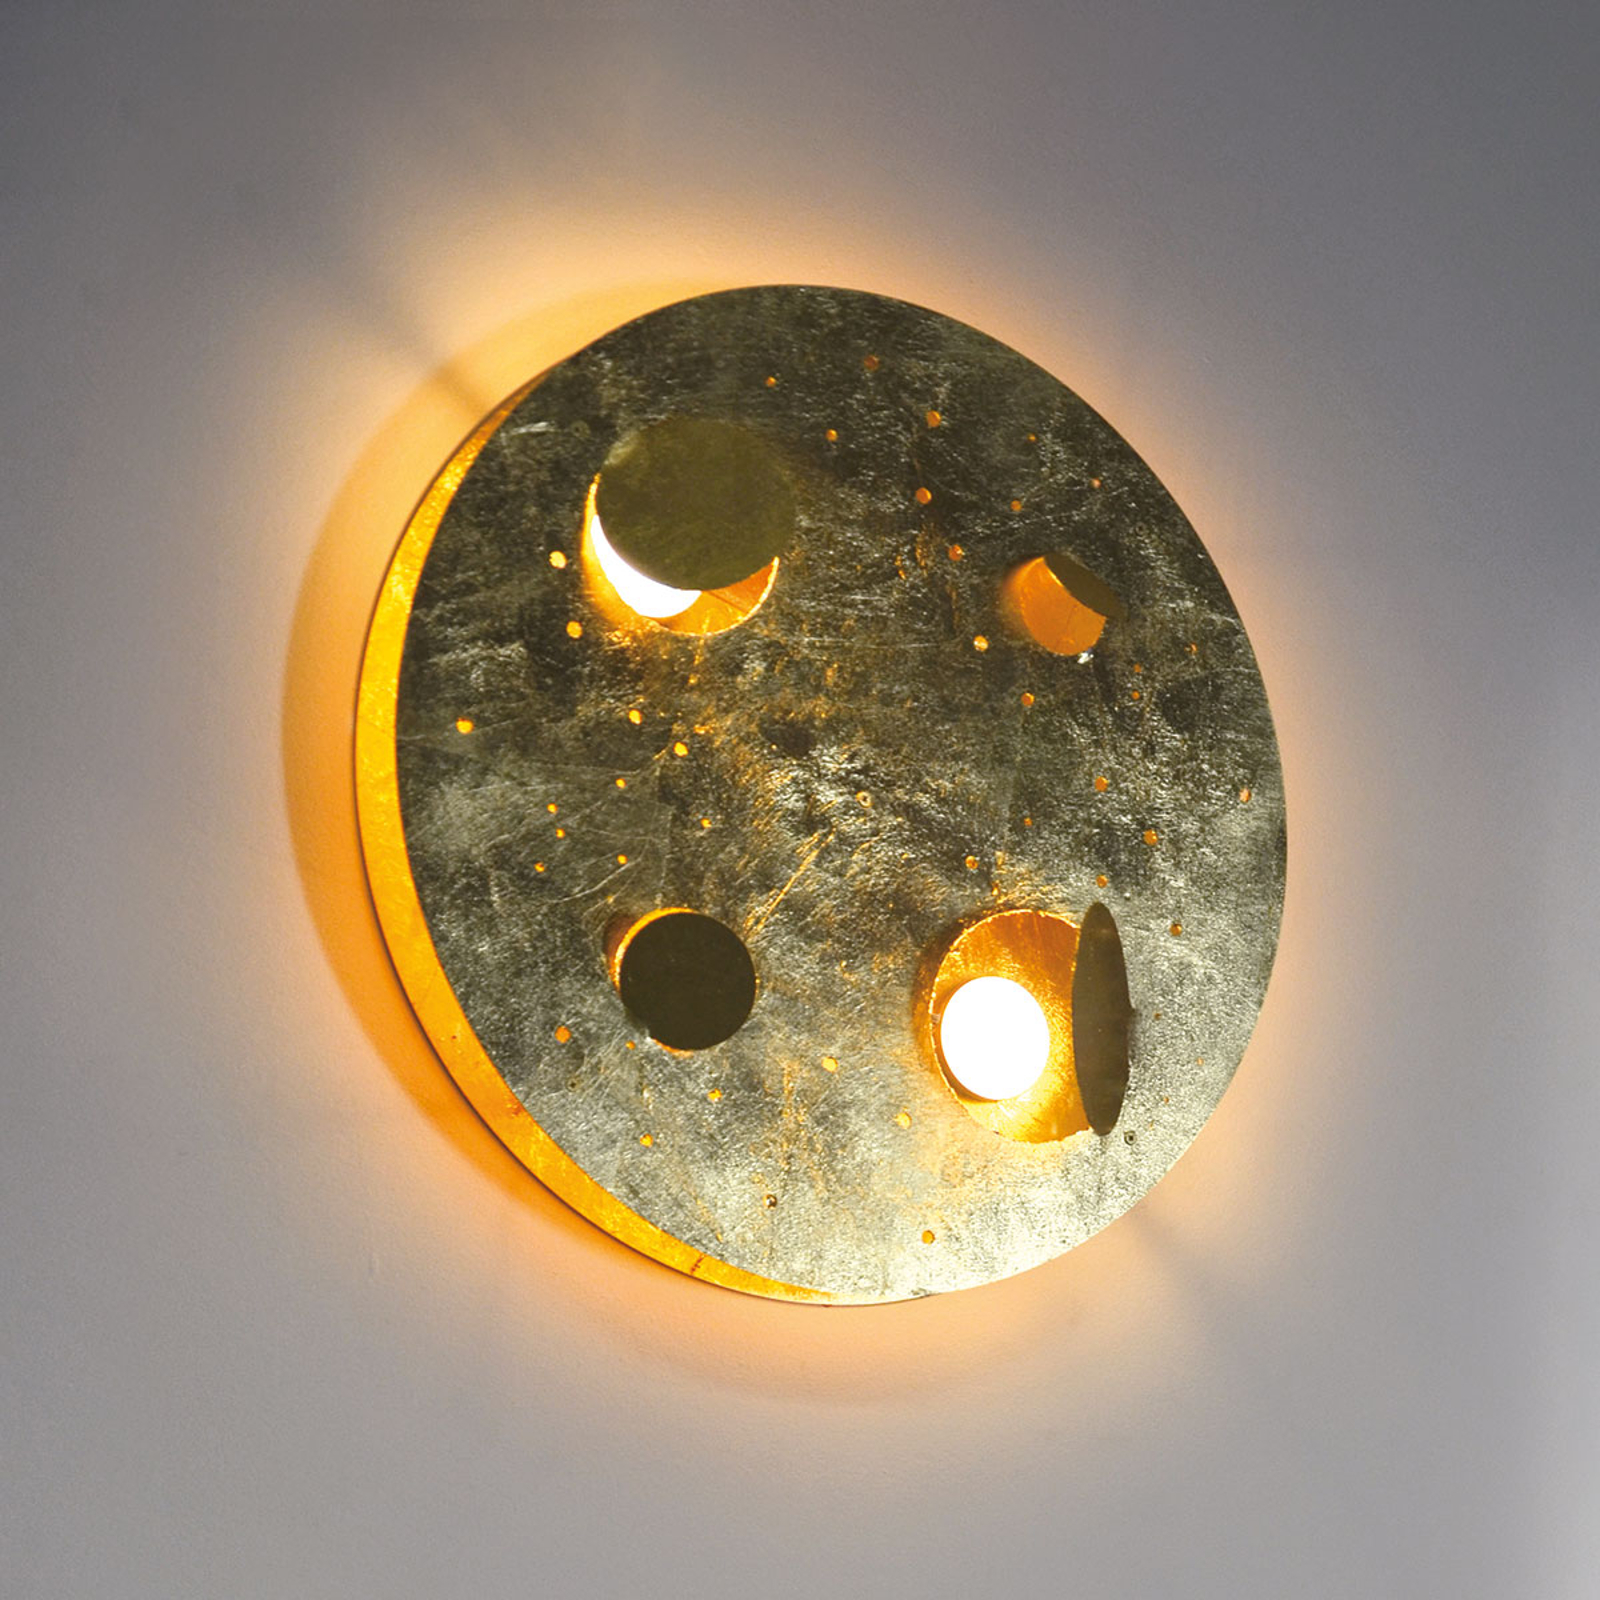 Knikerboker Buchi LED wandlamp Ø 40cm bladgoud